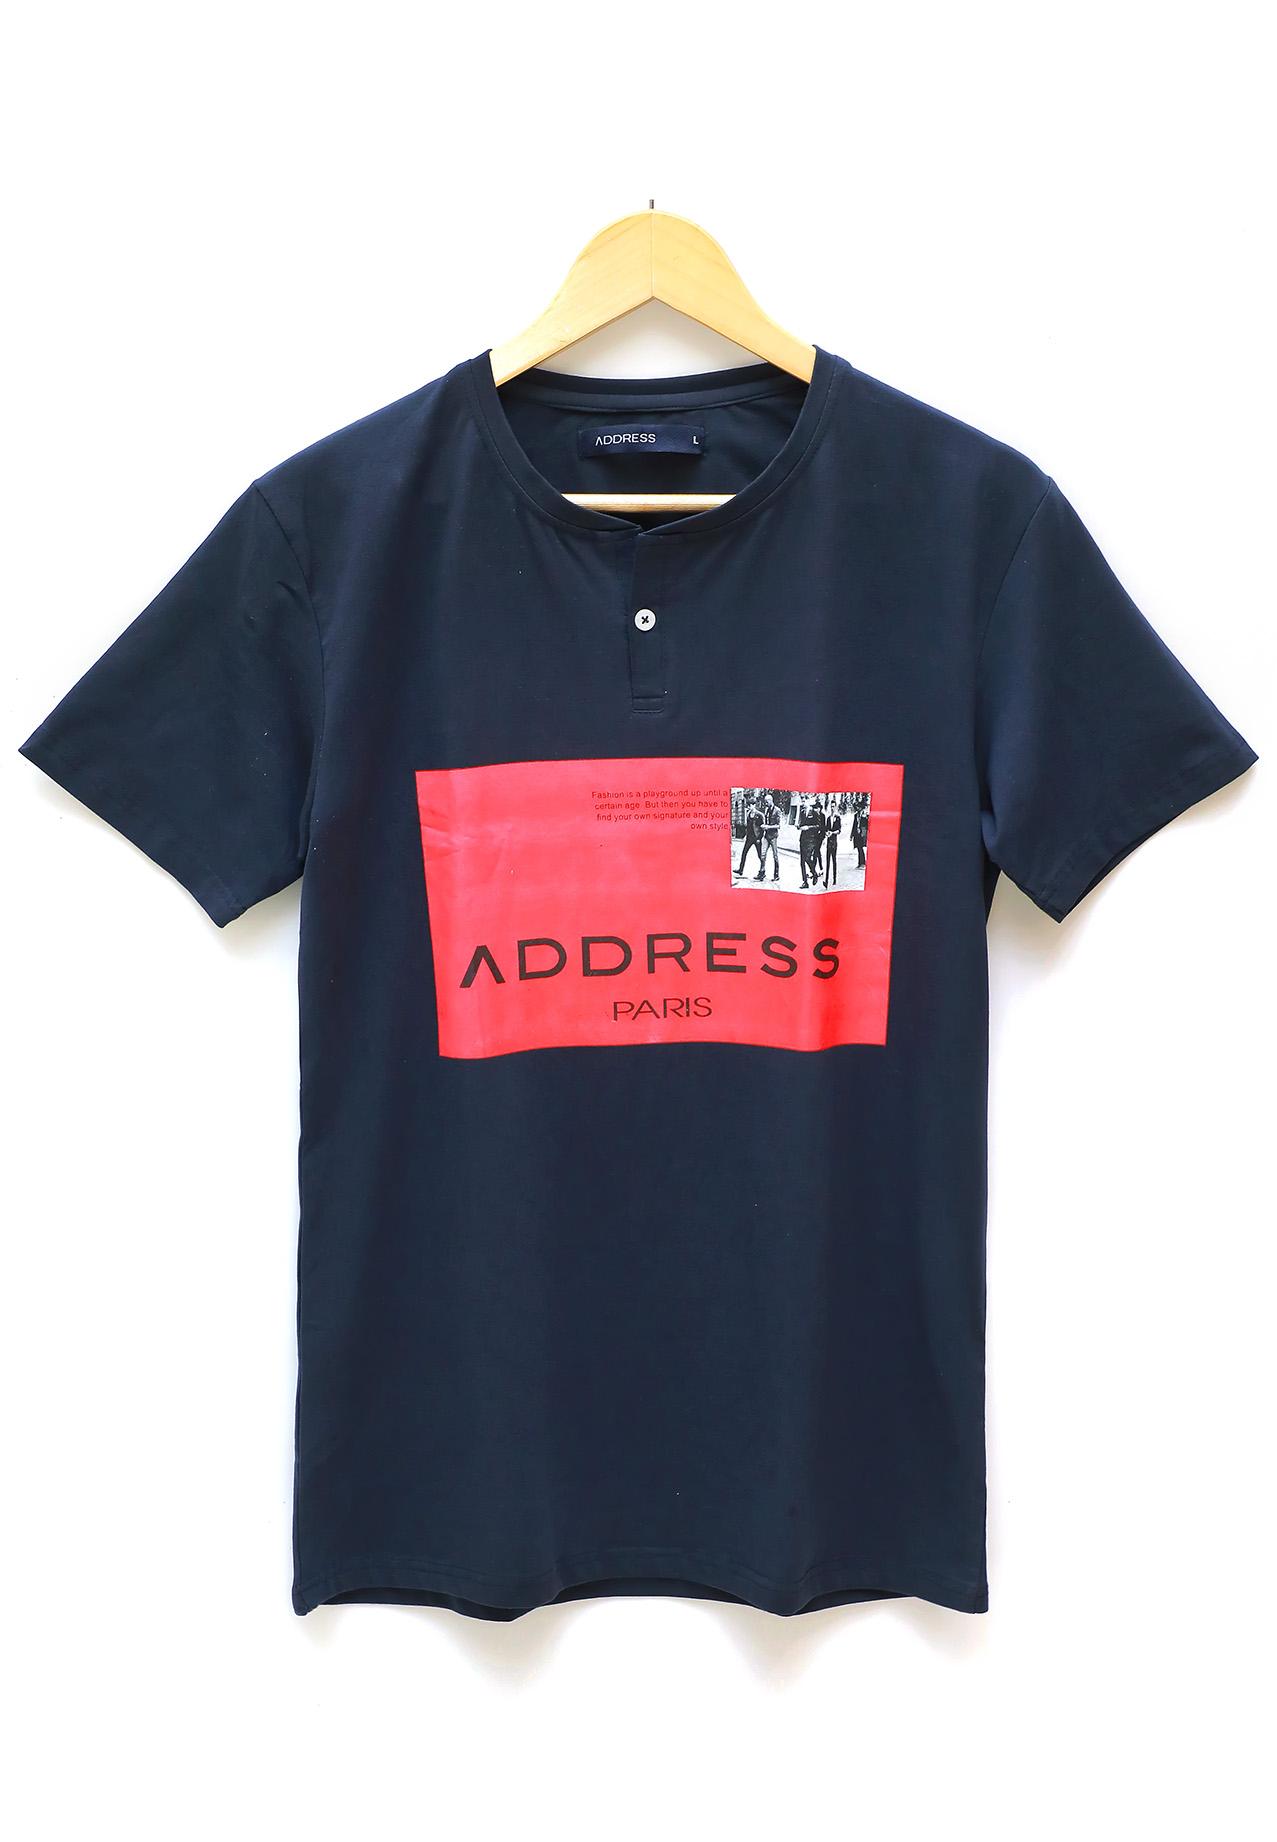 Address Printed T-Shirt Blue, Large